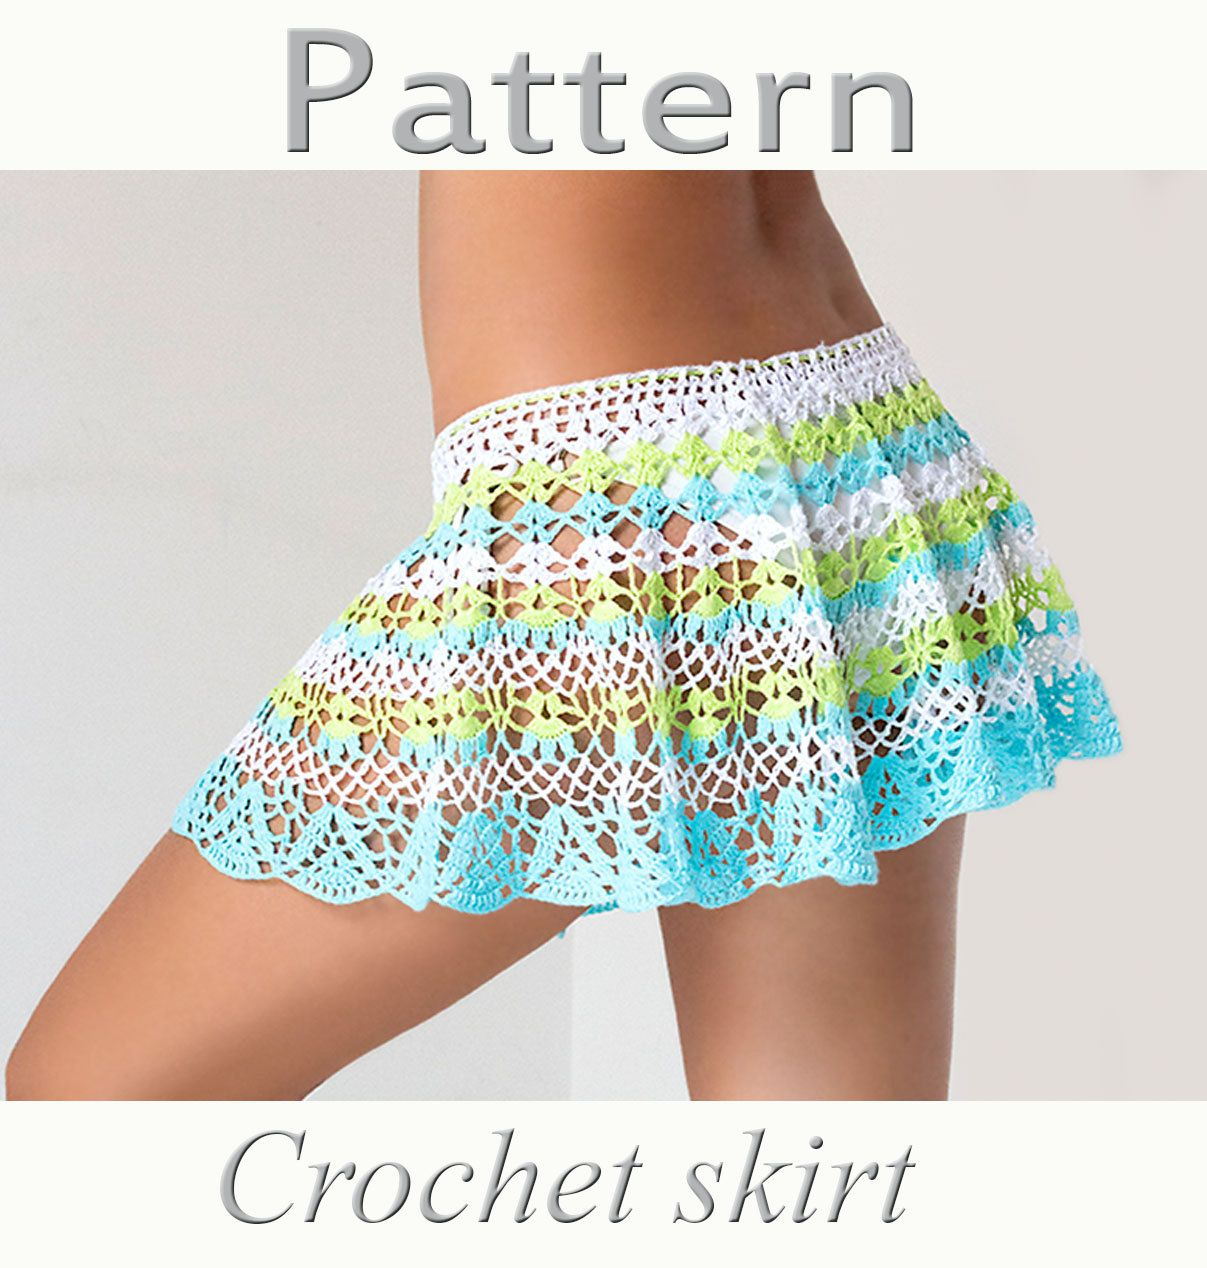 Pattern crochet beach skirt pdf lace cover up by katrinshine pattern crochet beach skirt pdf lace cover up by katrinshine 500 bankloansurffo Images